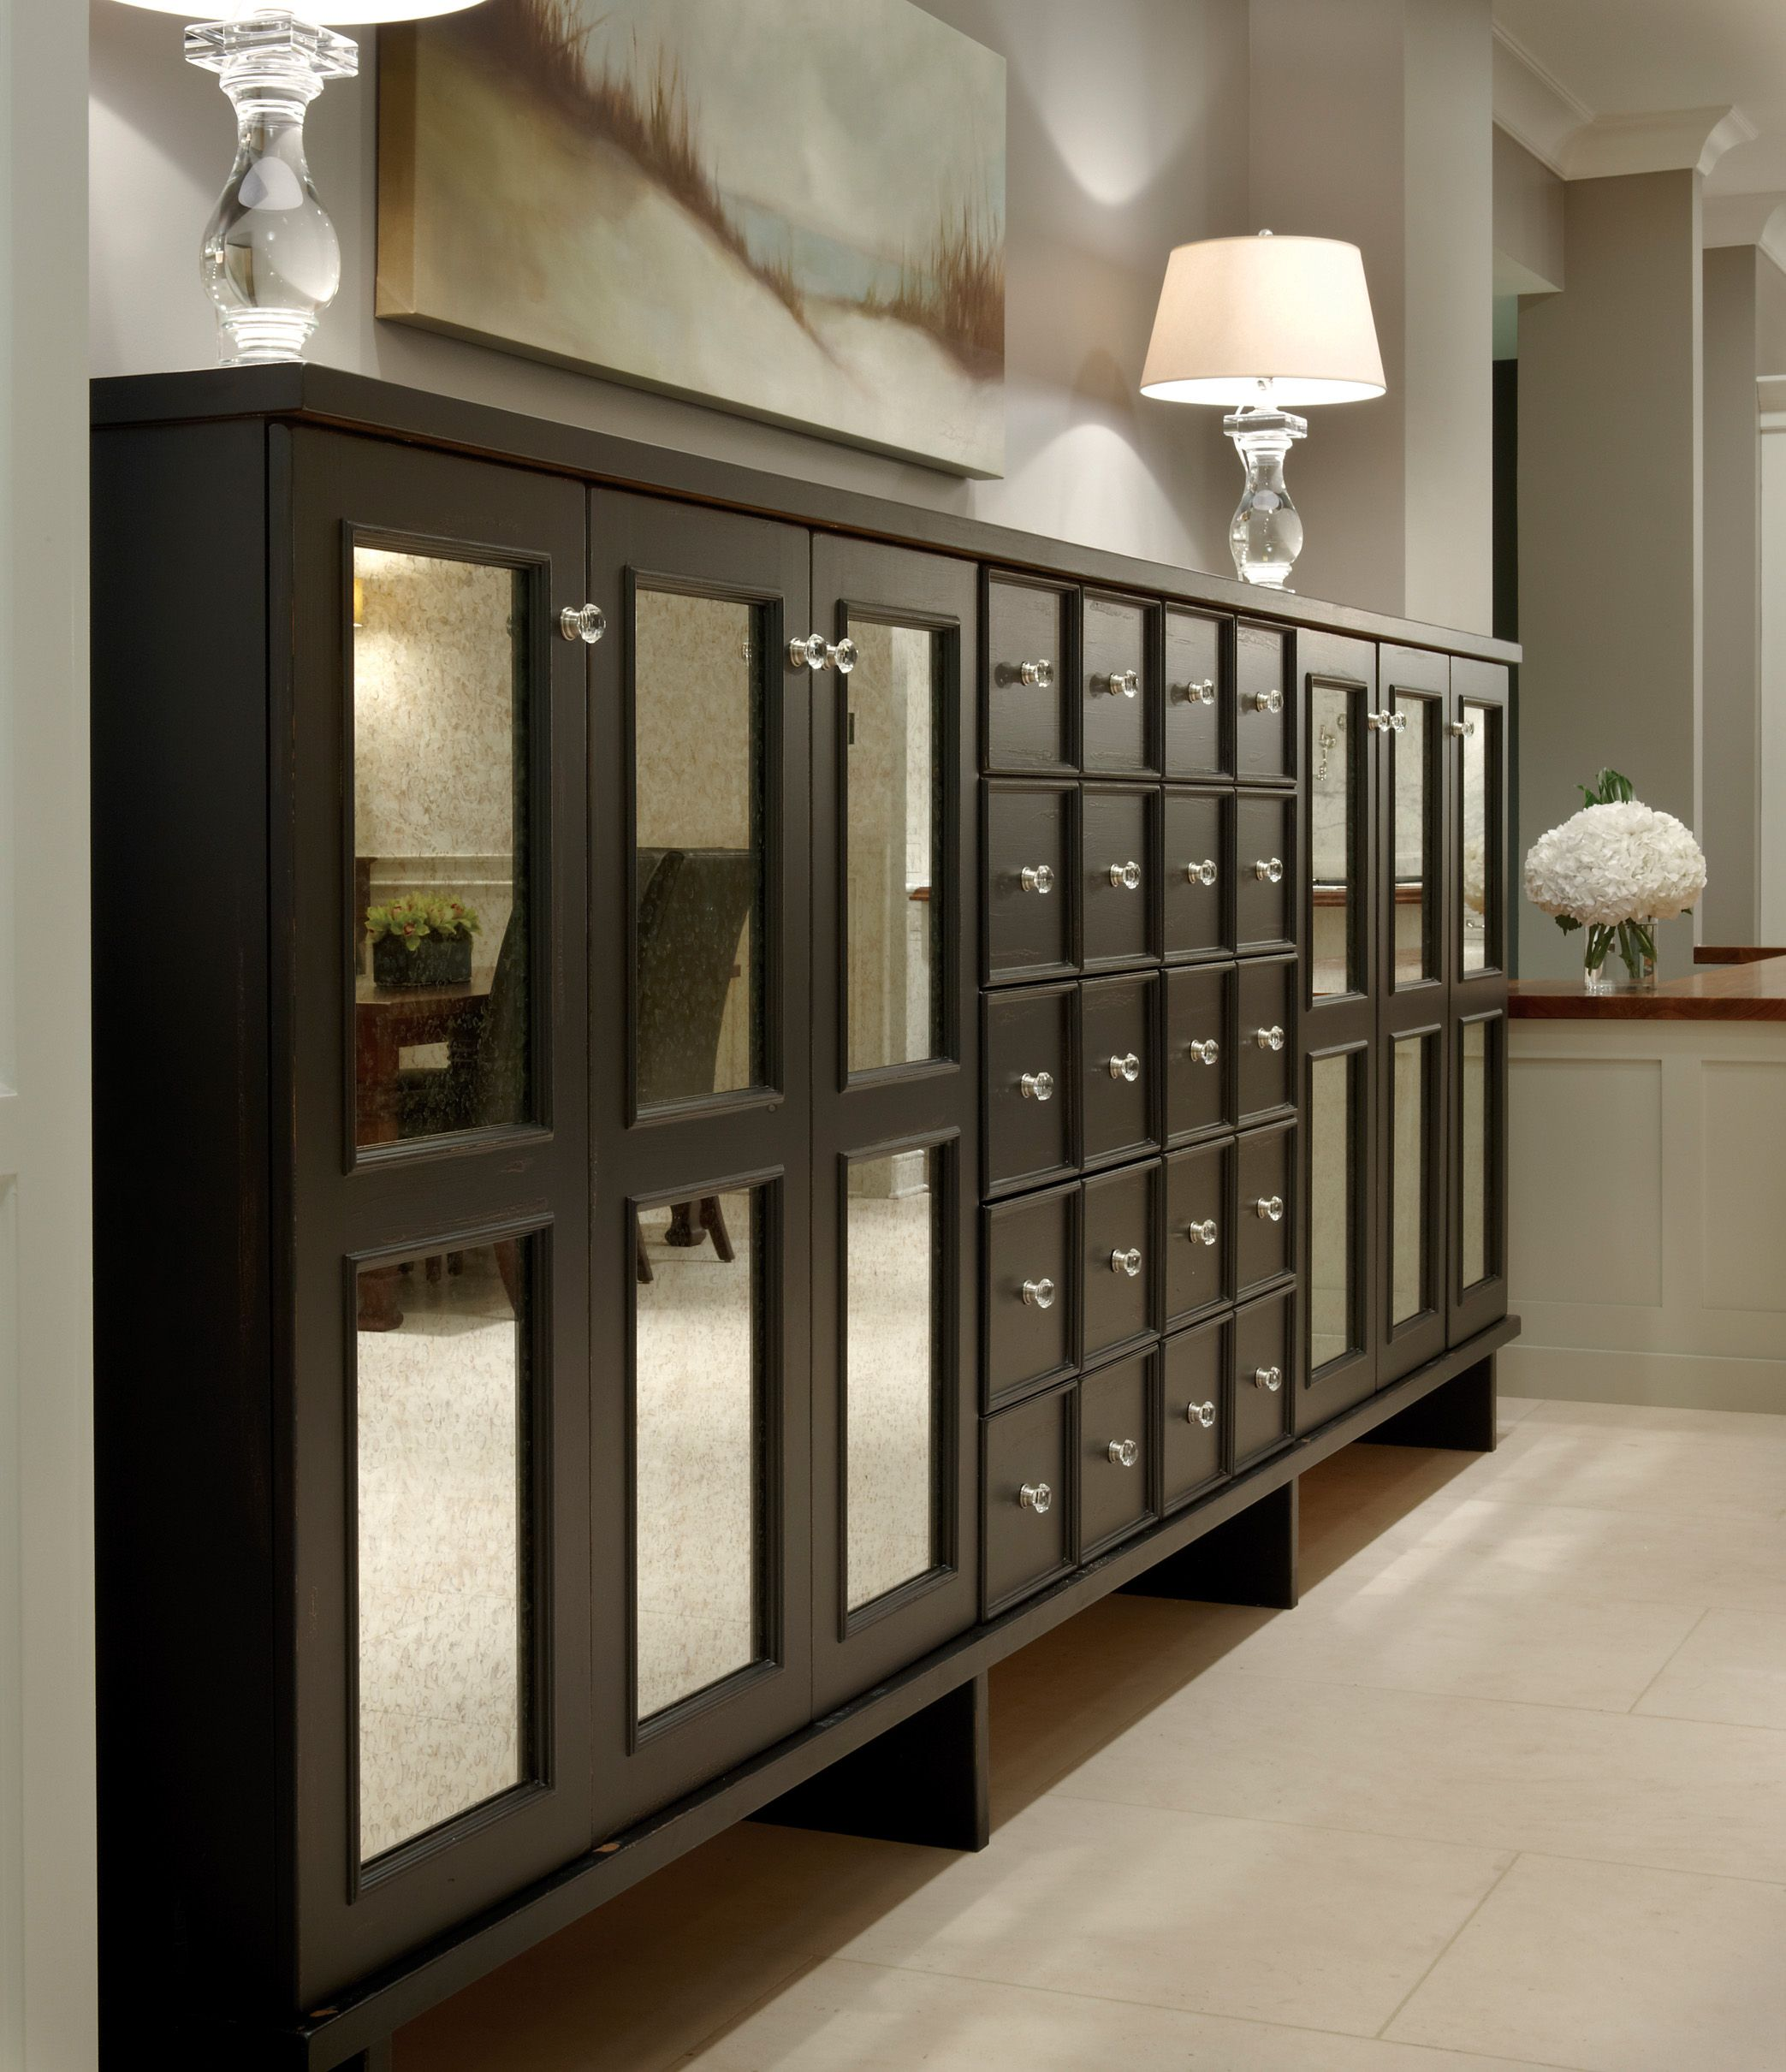 Best 25+ Bedroom cabinets ideas on Pinterest | Built in ...